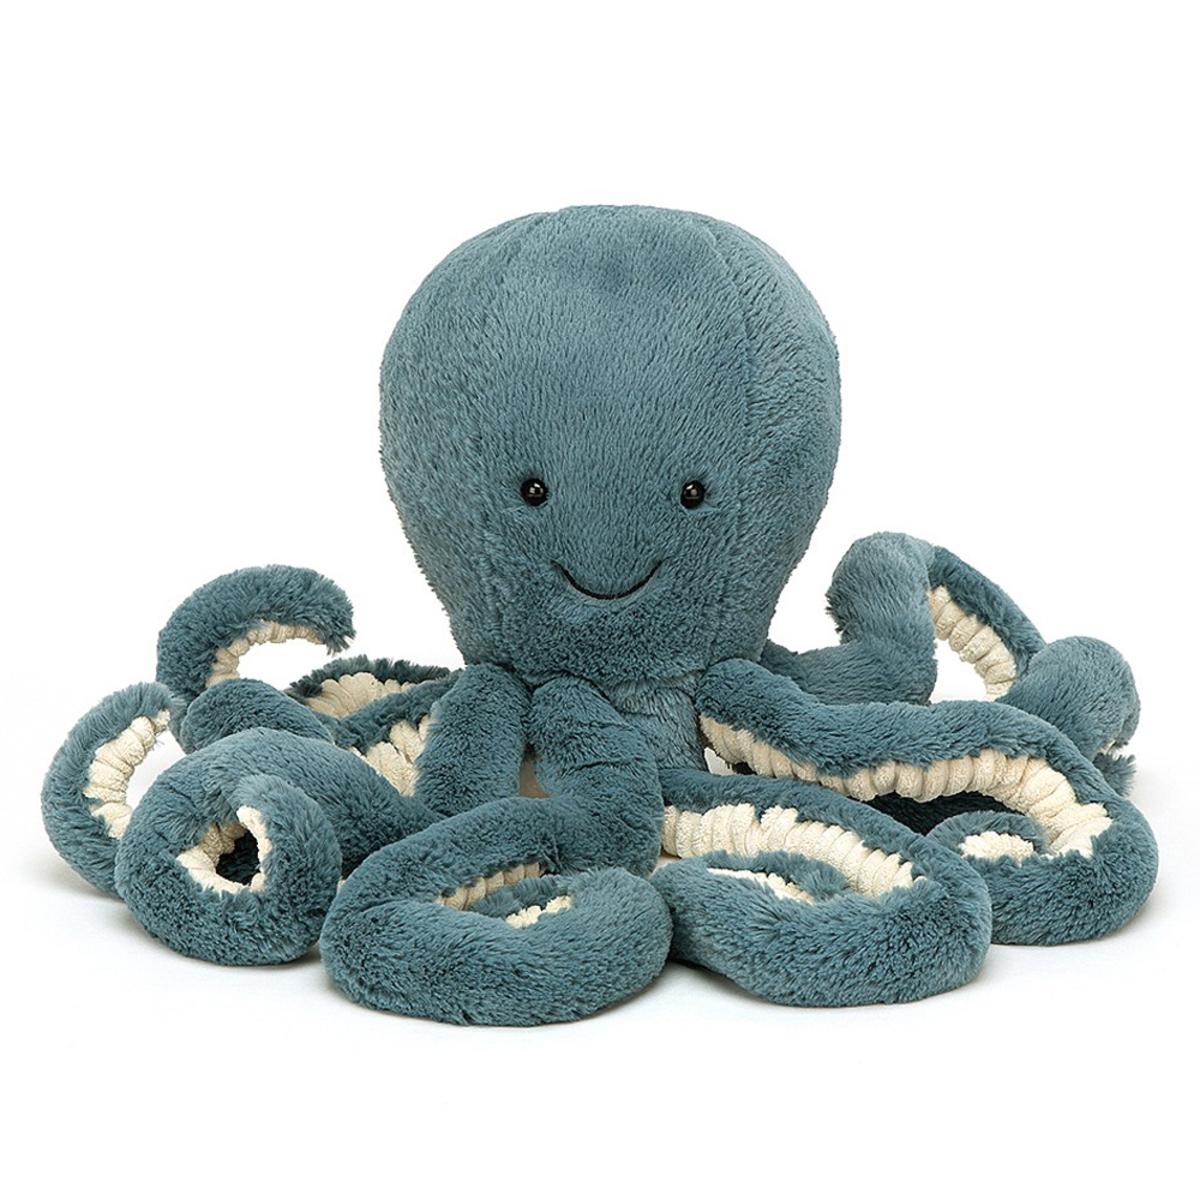 Peluche Storm Octopus - Small Peluche Pieuvre 23 cm